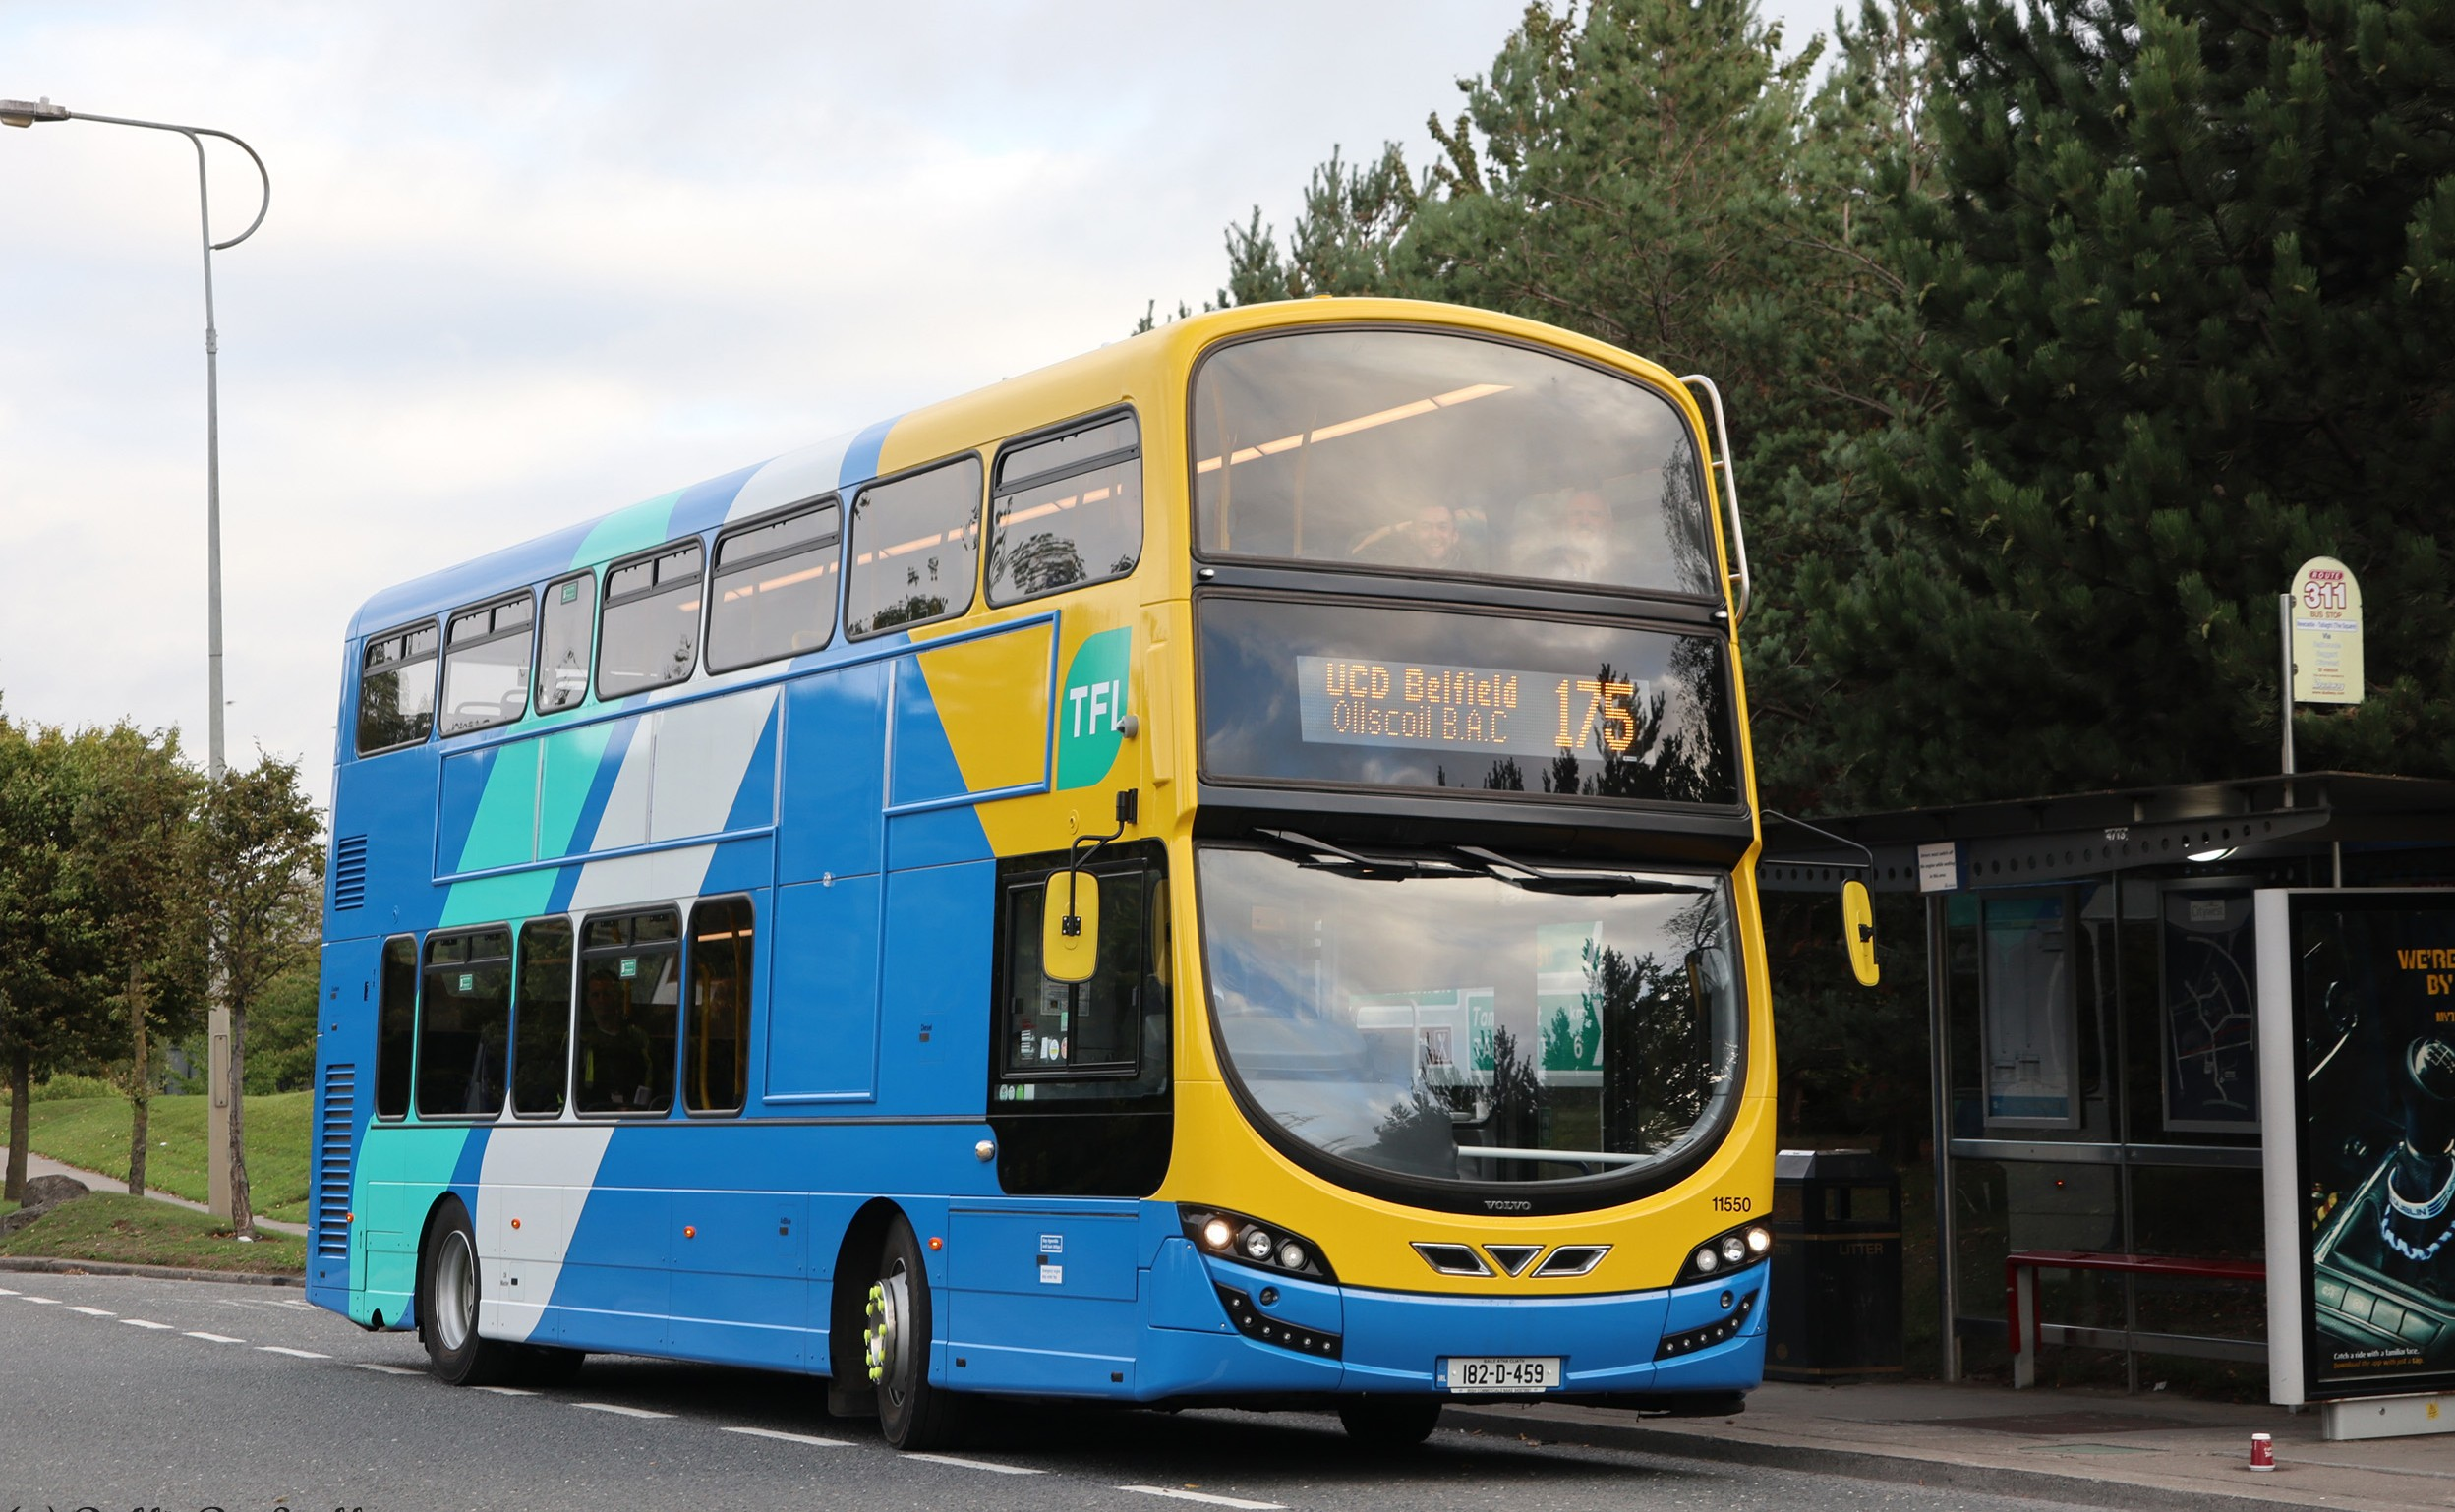 #AYearOfBuses 175: Citywest – UCD Belfield